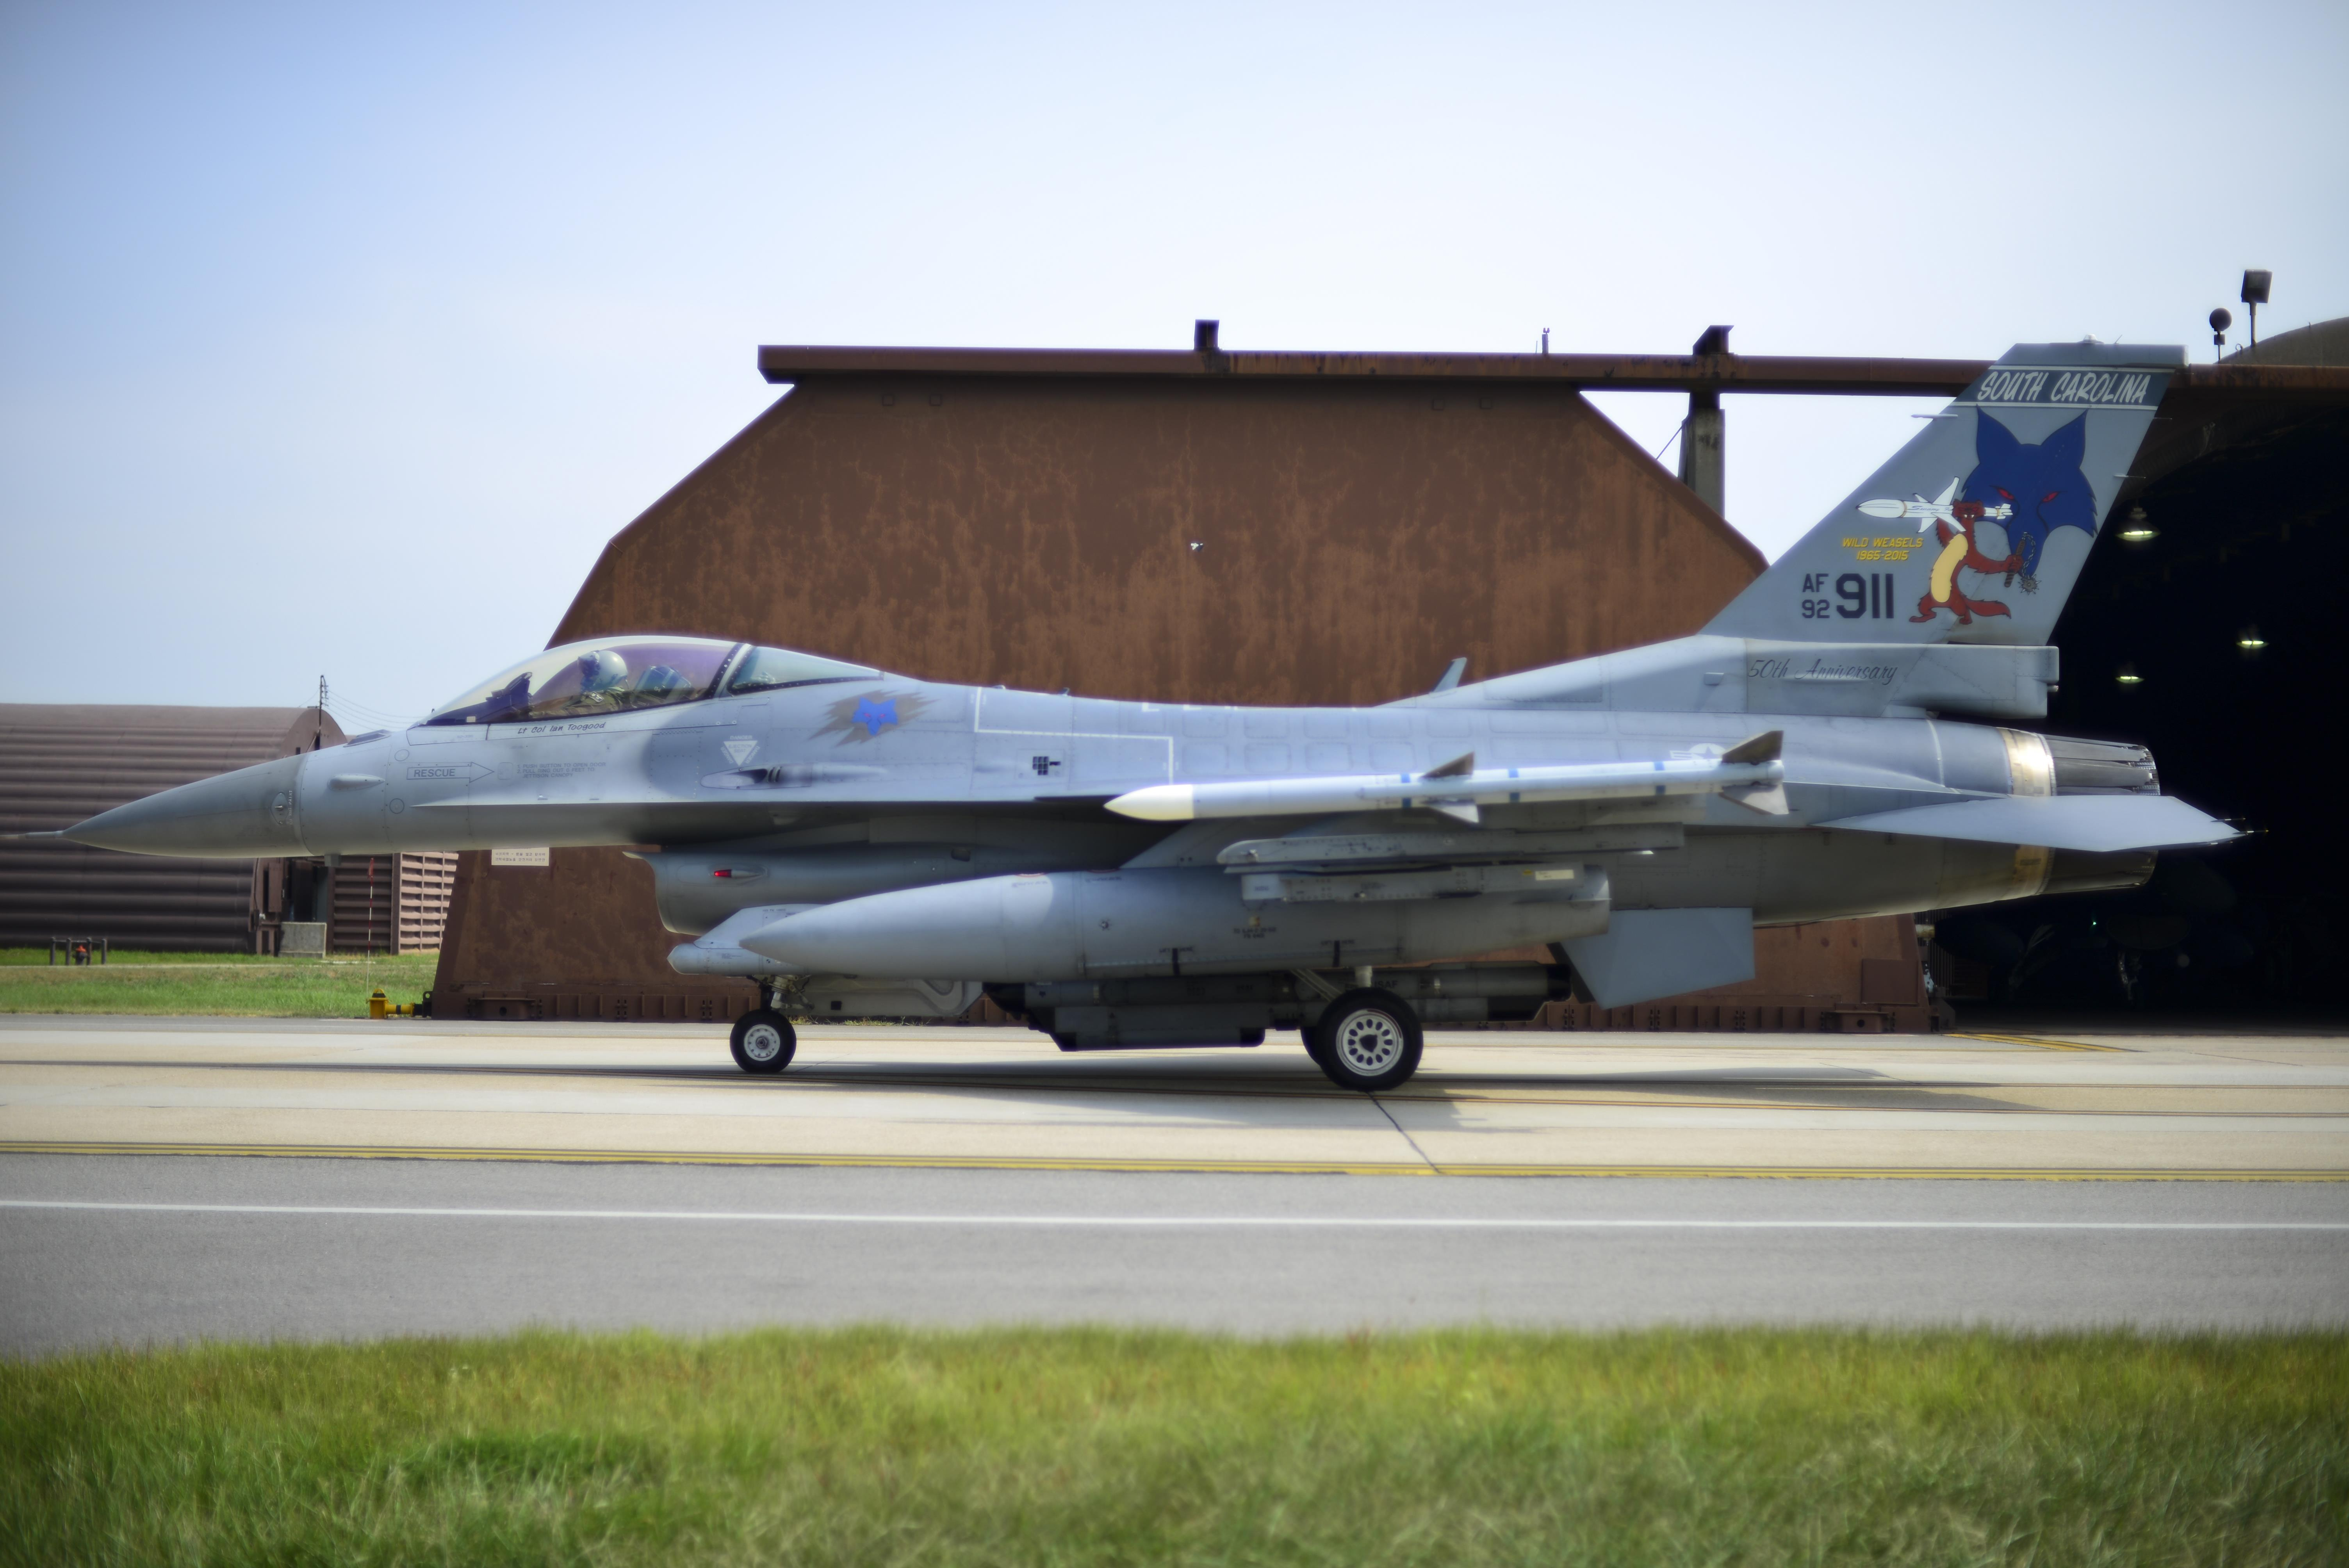 Falcon Herd mustangs mopp up beverly herd 16 2 osan air base article display